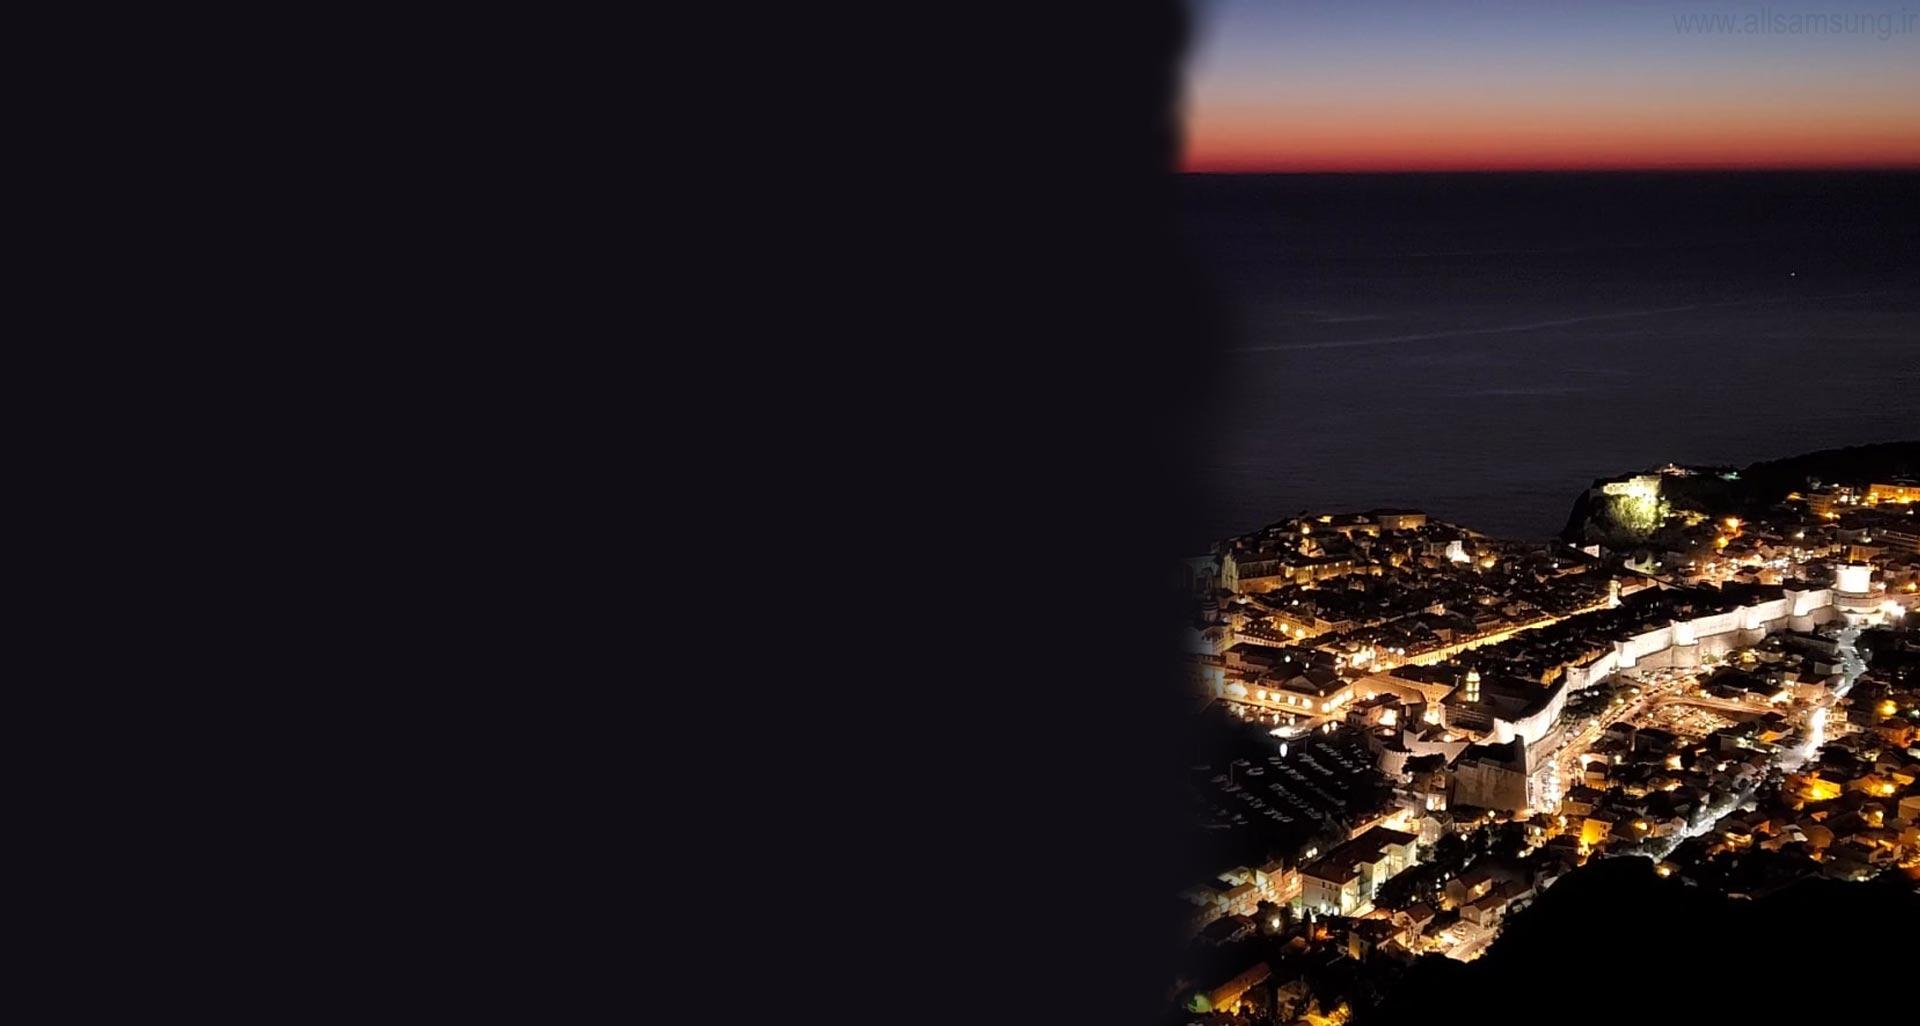 Galaxy Z Flip، آماده برای عکاسی در شب